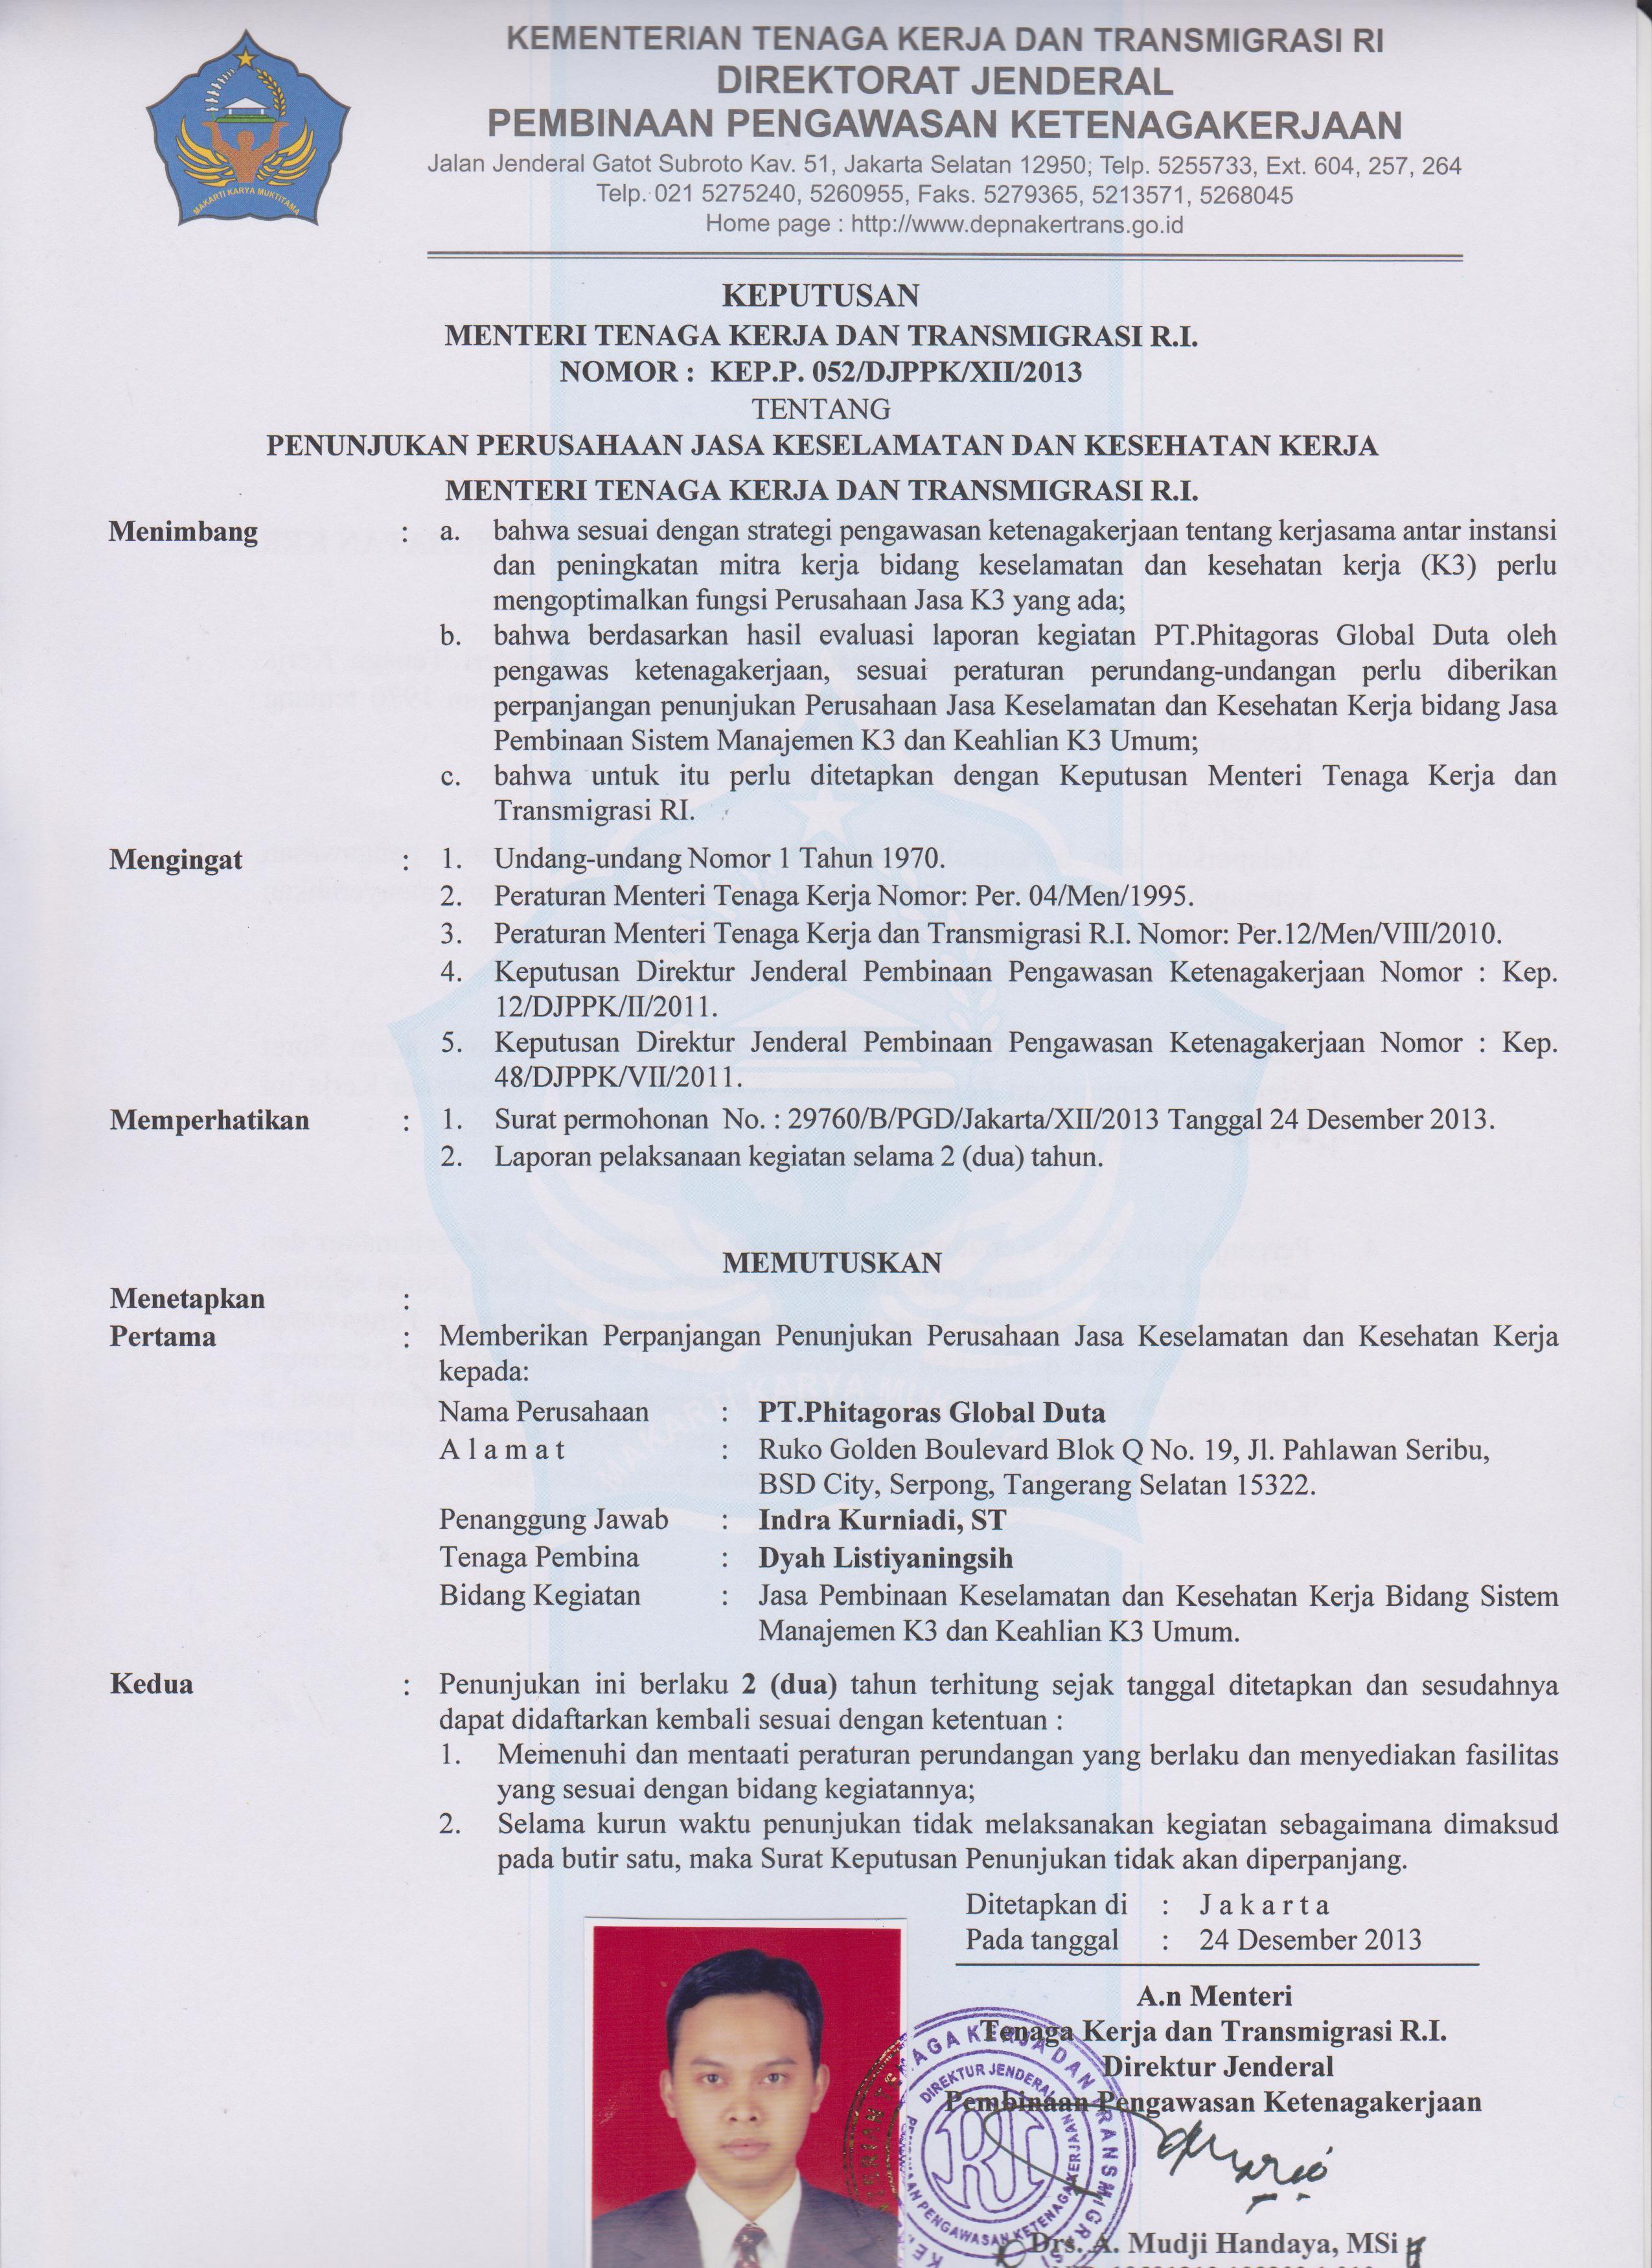 Sertifikat K3 2012 Training Ahli K3 Hse Consultant Konsultan Iso Nebosh Indonesia